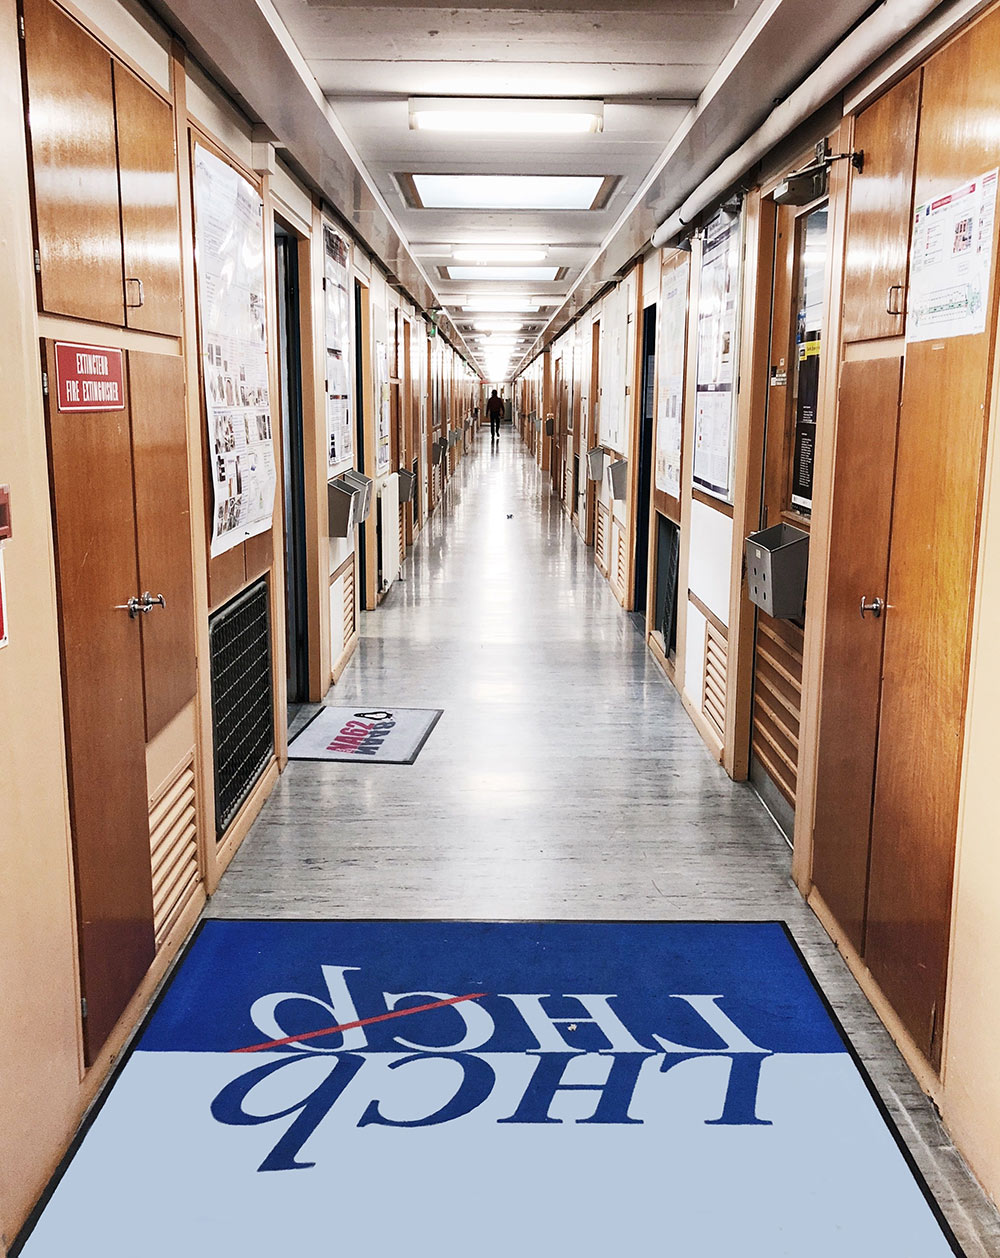 LHCb hallway